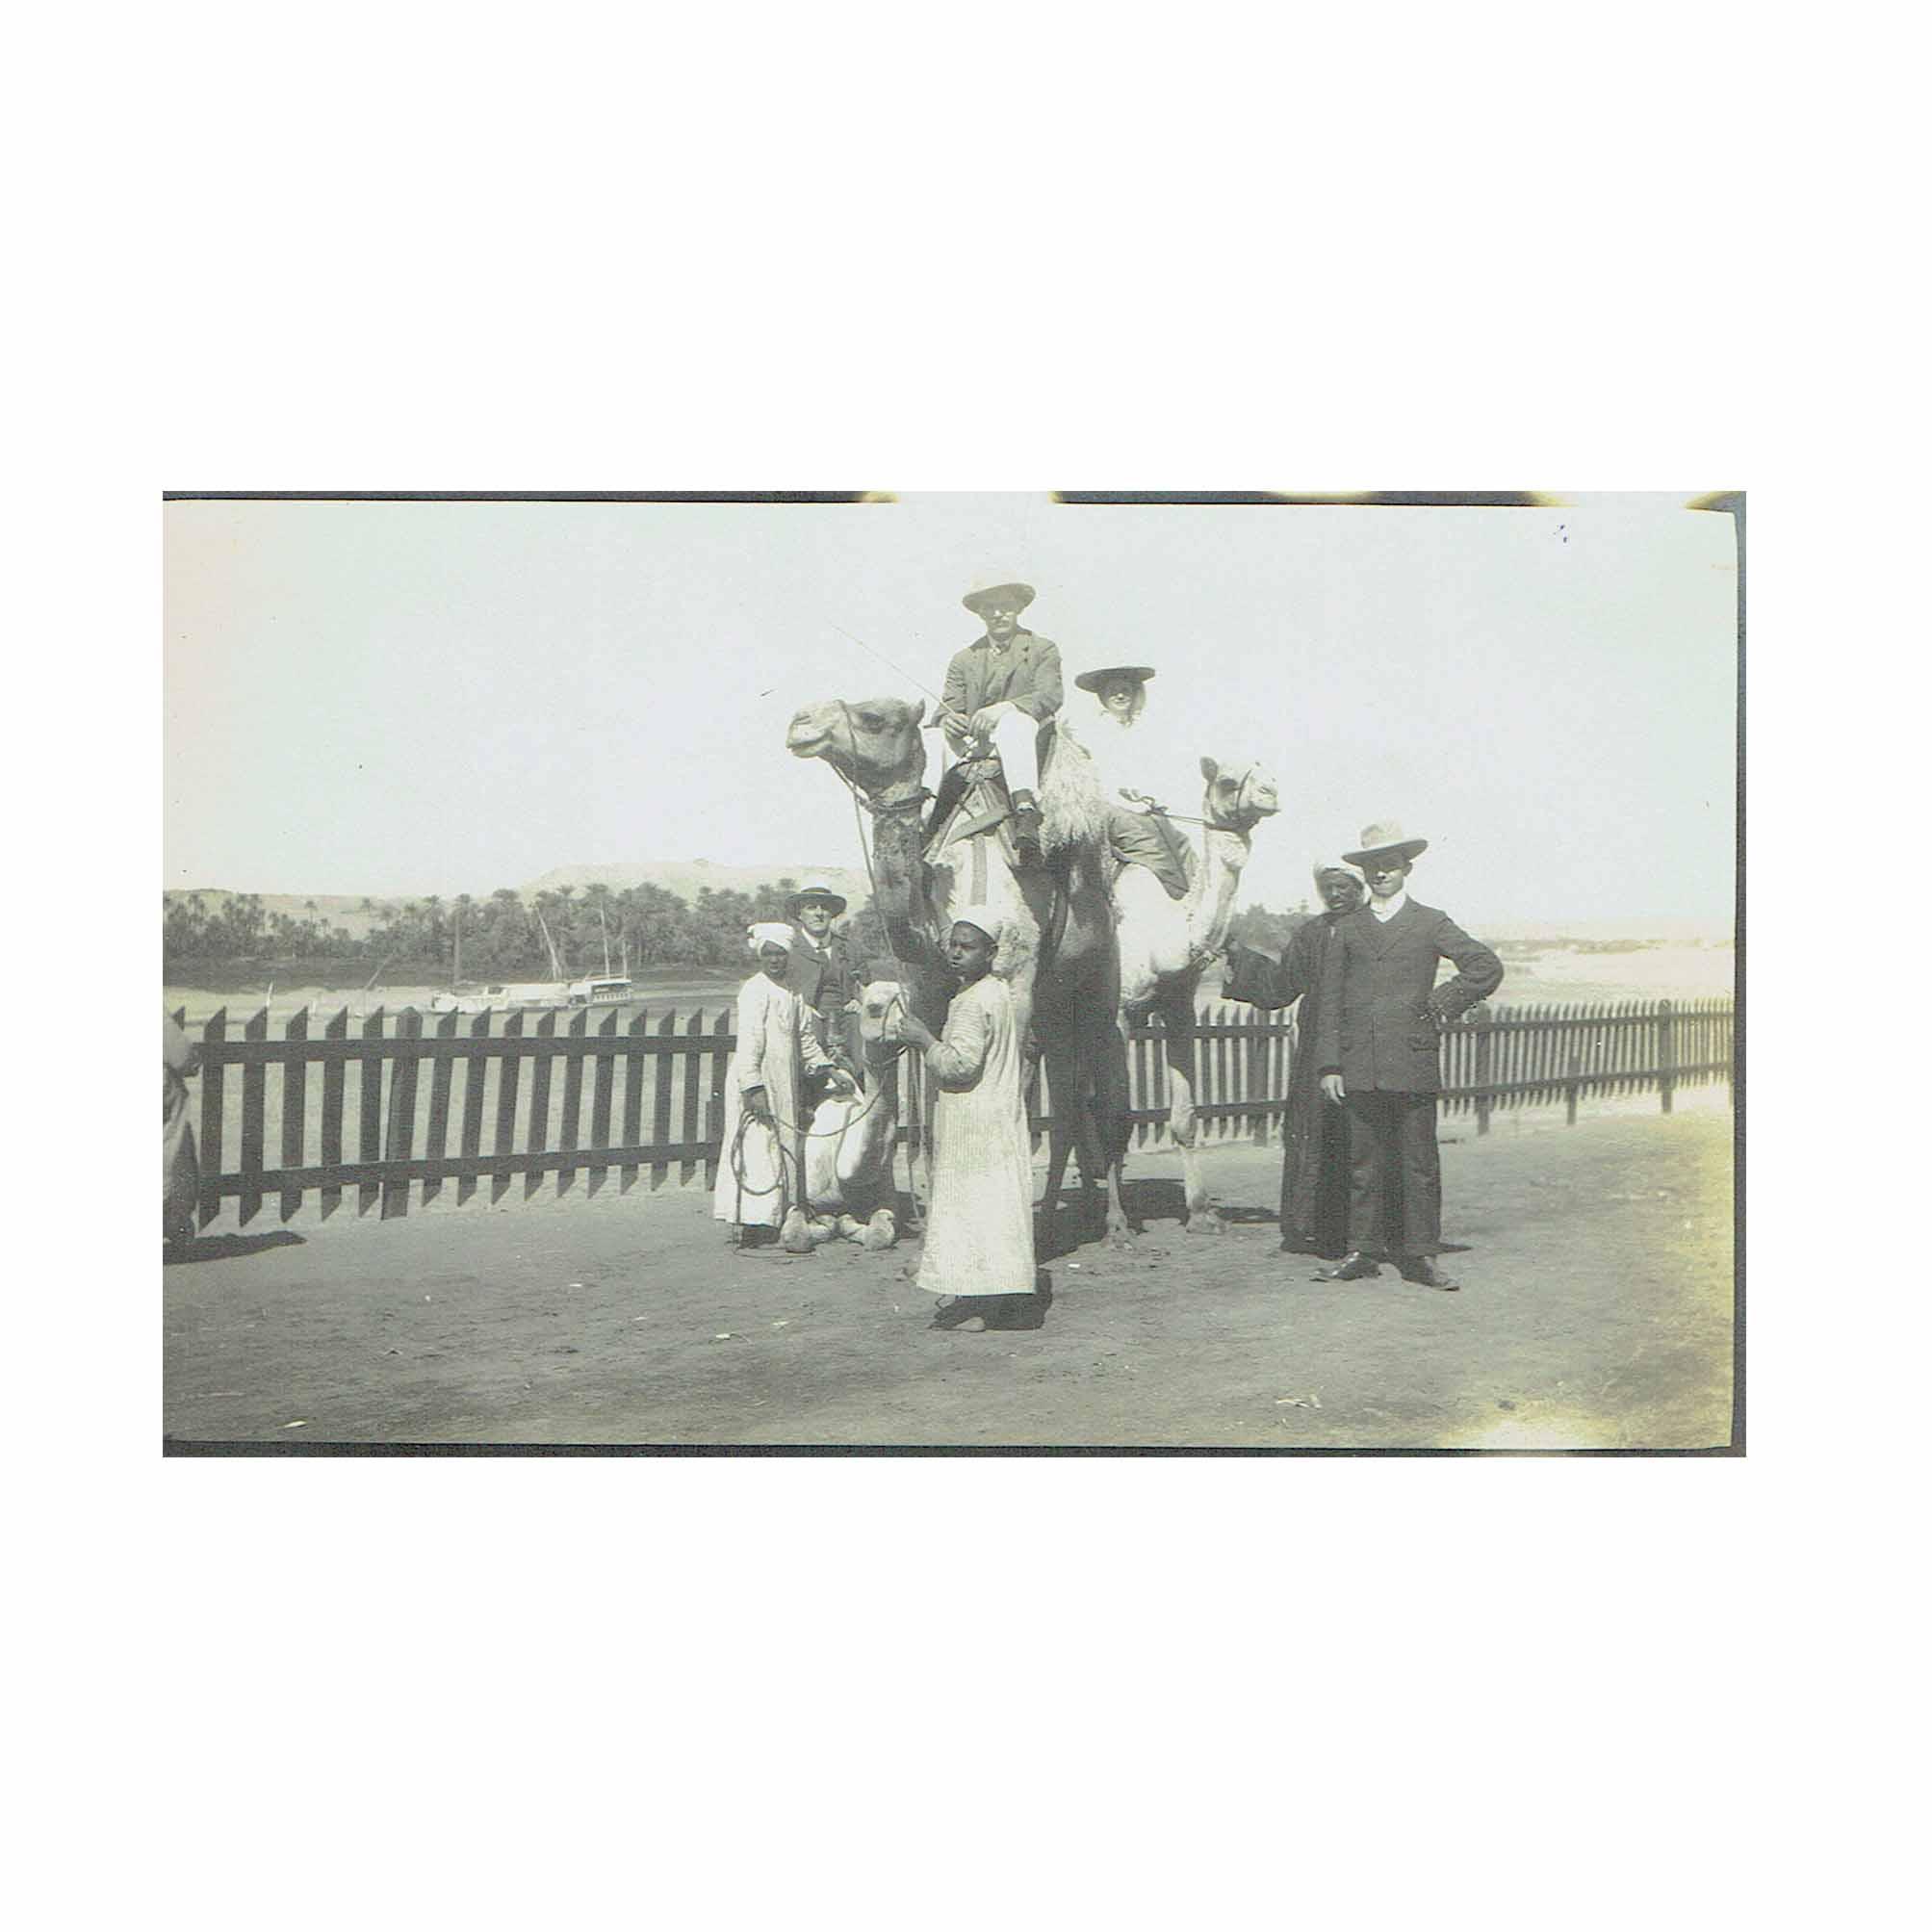 5567-Album-Foto-Auersperg-Aegypten-1908-1909-5-A-N-1.jpg